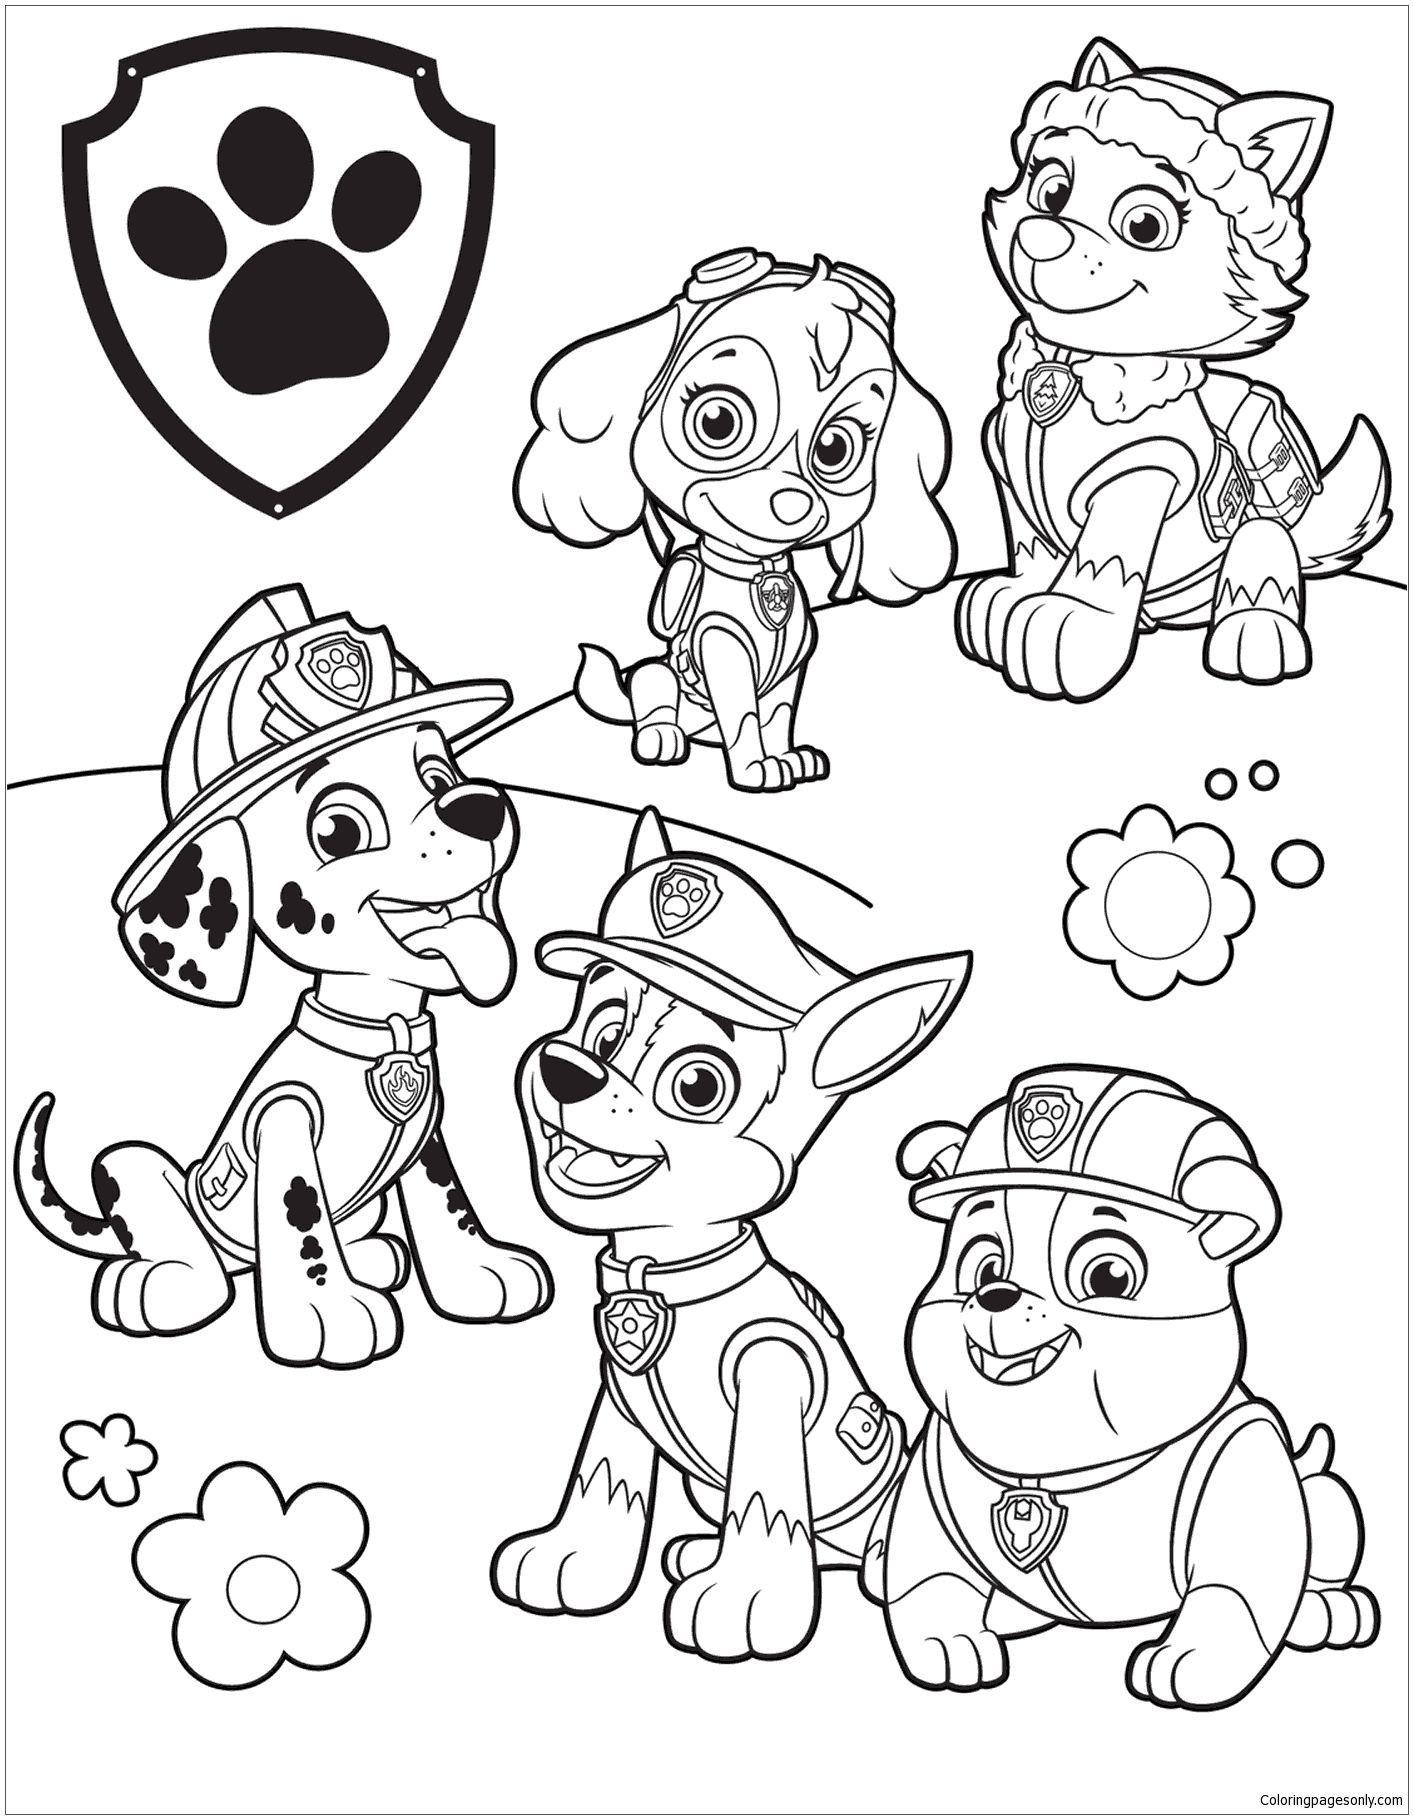 Paw Patrol Ausmalbilder Coloring Marshall And Zuma Coloring Page Kids Pages Paw Paw Patrol Ausmalbilder Malvorlagen Ausmalbilder